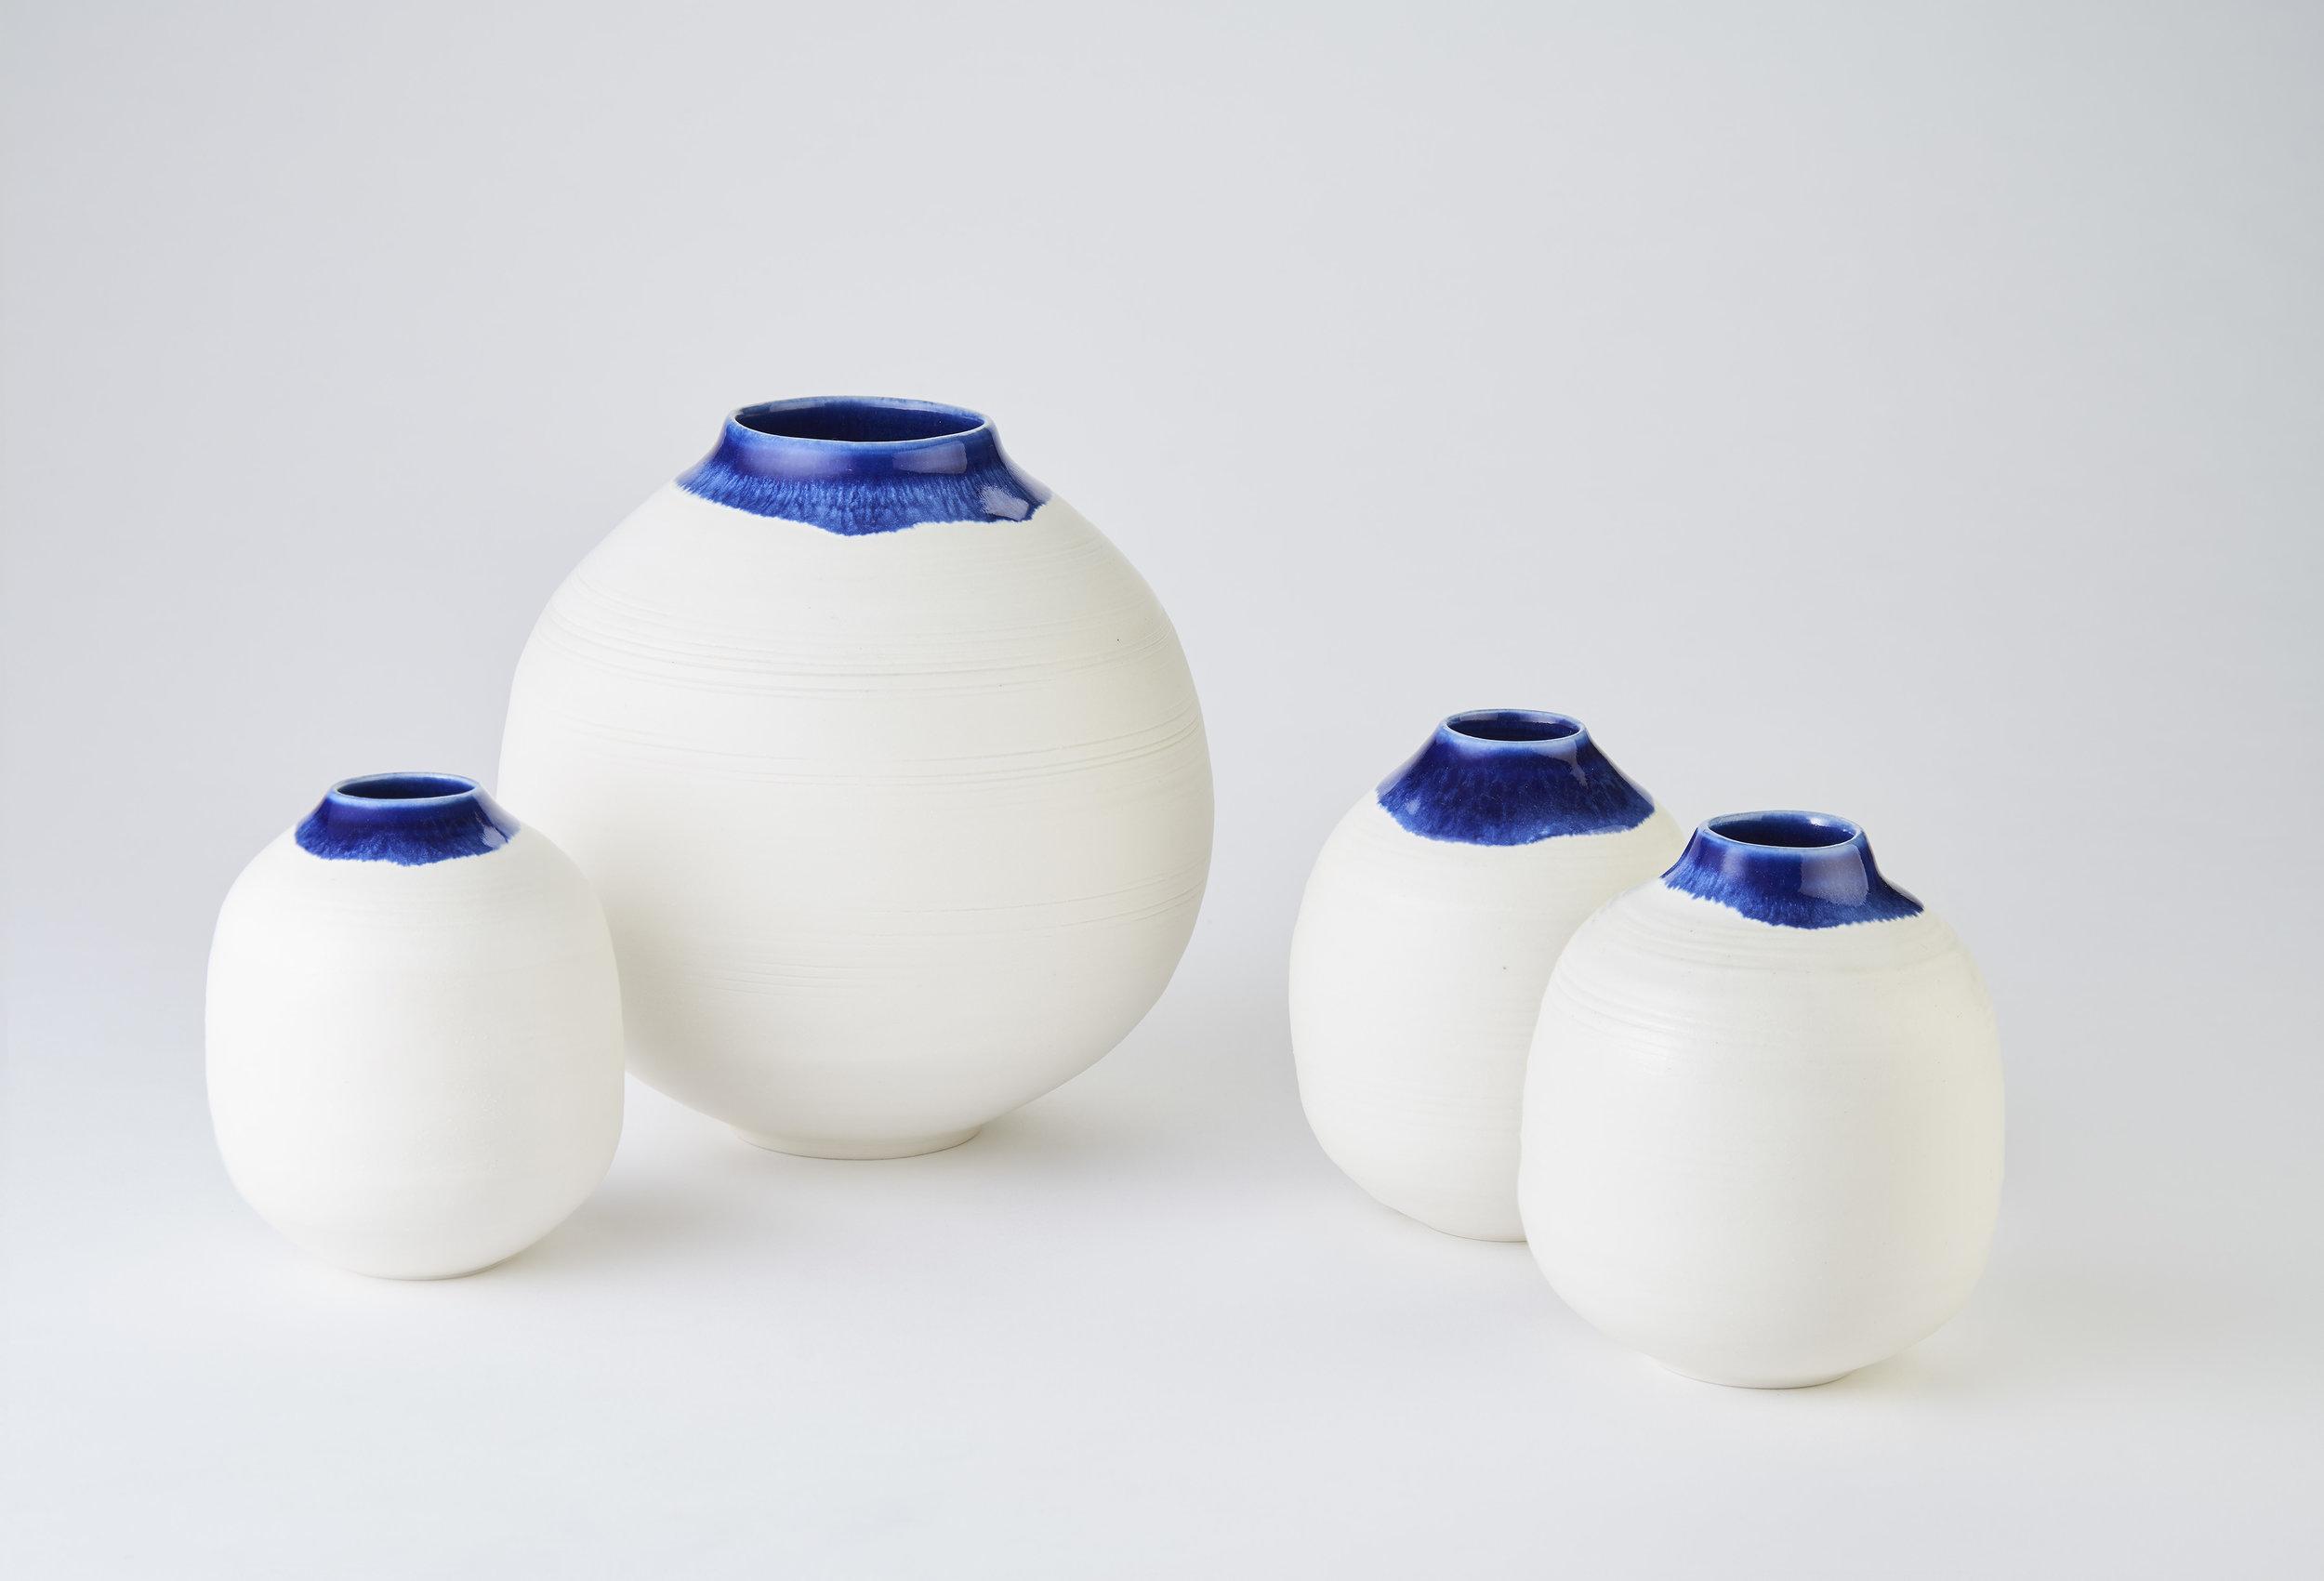 KA Ceramics Porcelain medium (5.5cm x 17cm) and small (3cm x 11cm) moon jars with blue inside and blue:dol and tin on rim 5.5cm x 17cm. Matthew Booth Photography.jpg